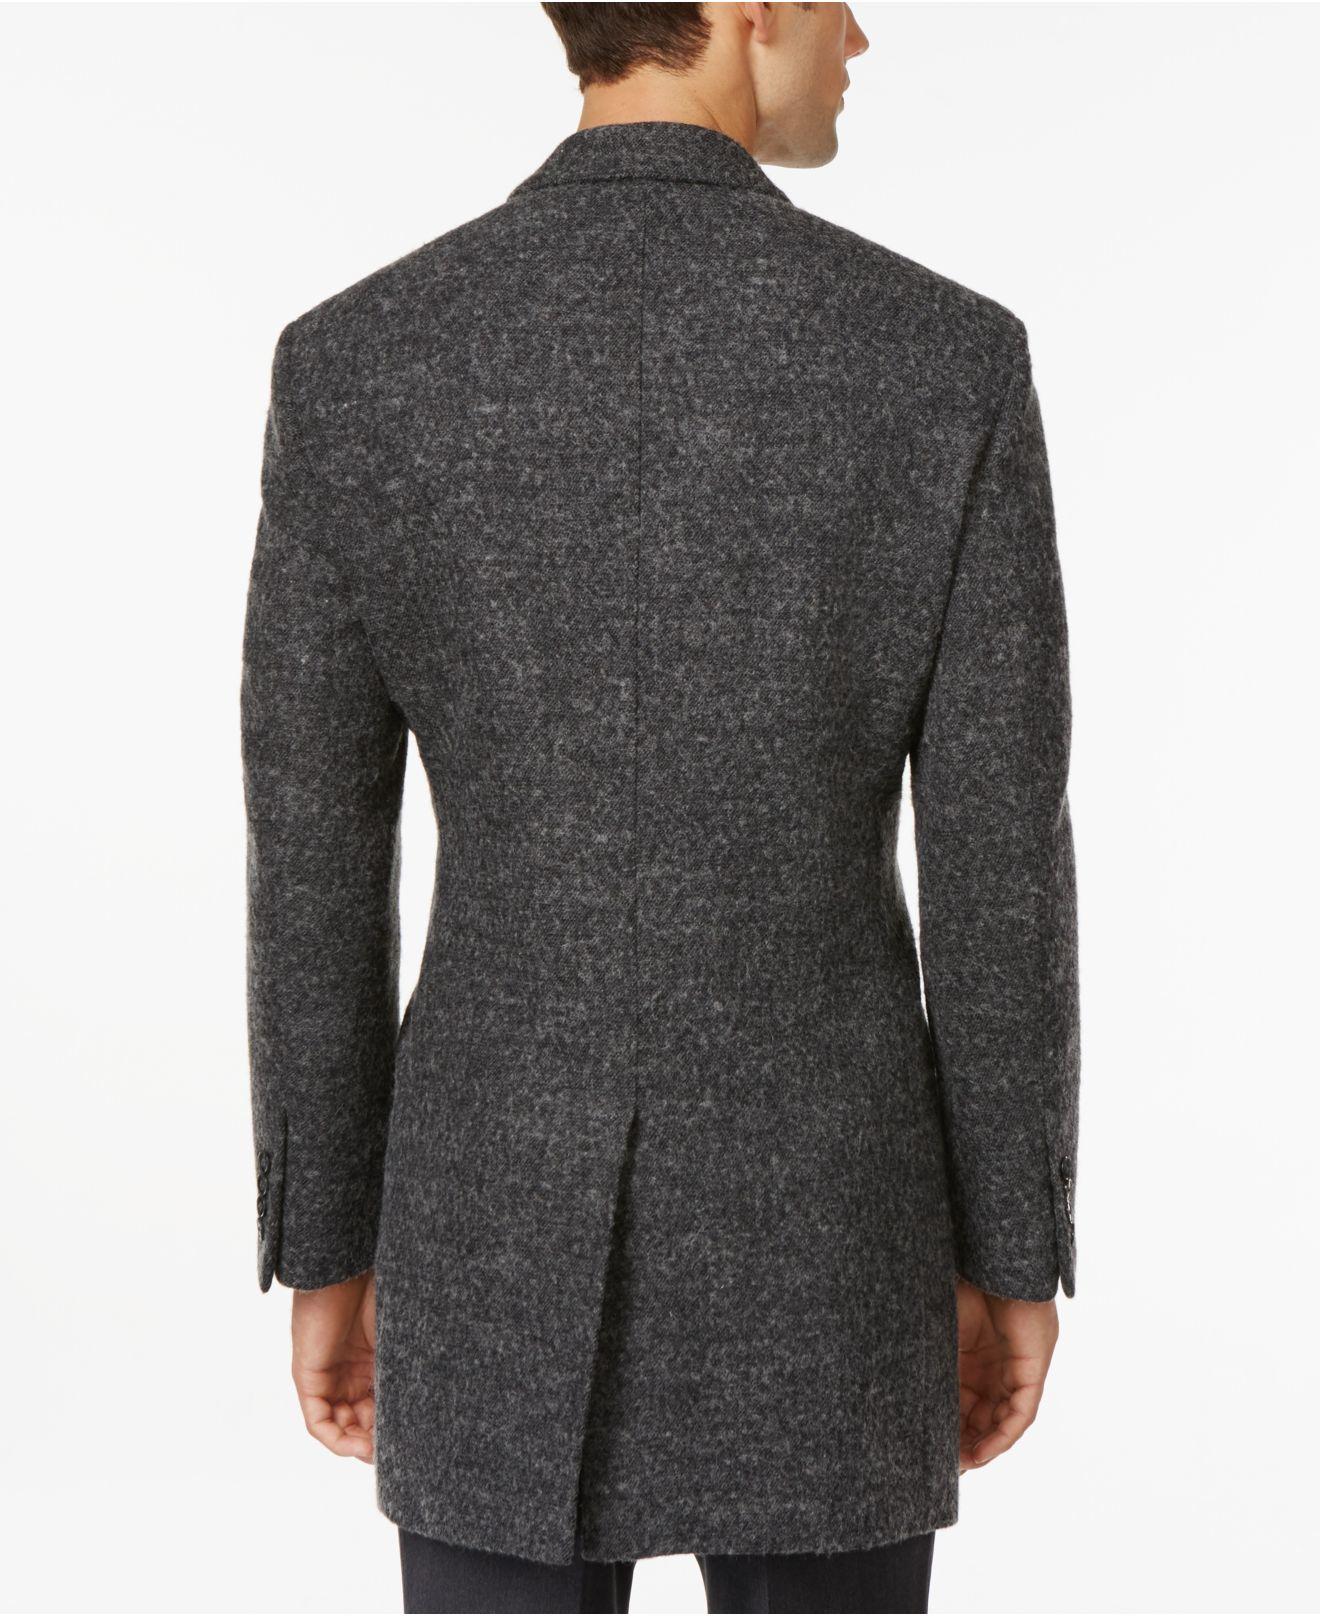 Calvin klein x fit charcoal melange extra slim fit for Calvin klein x fit dress shirt